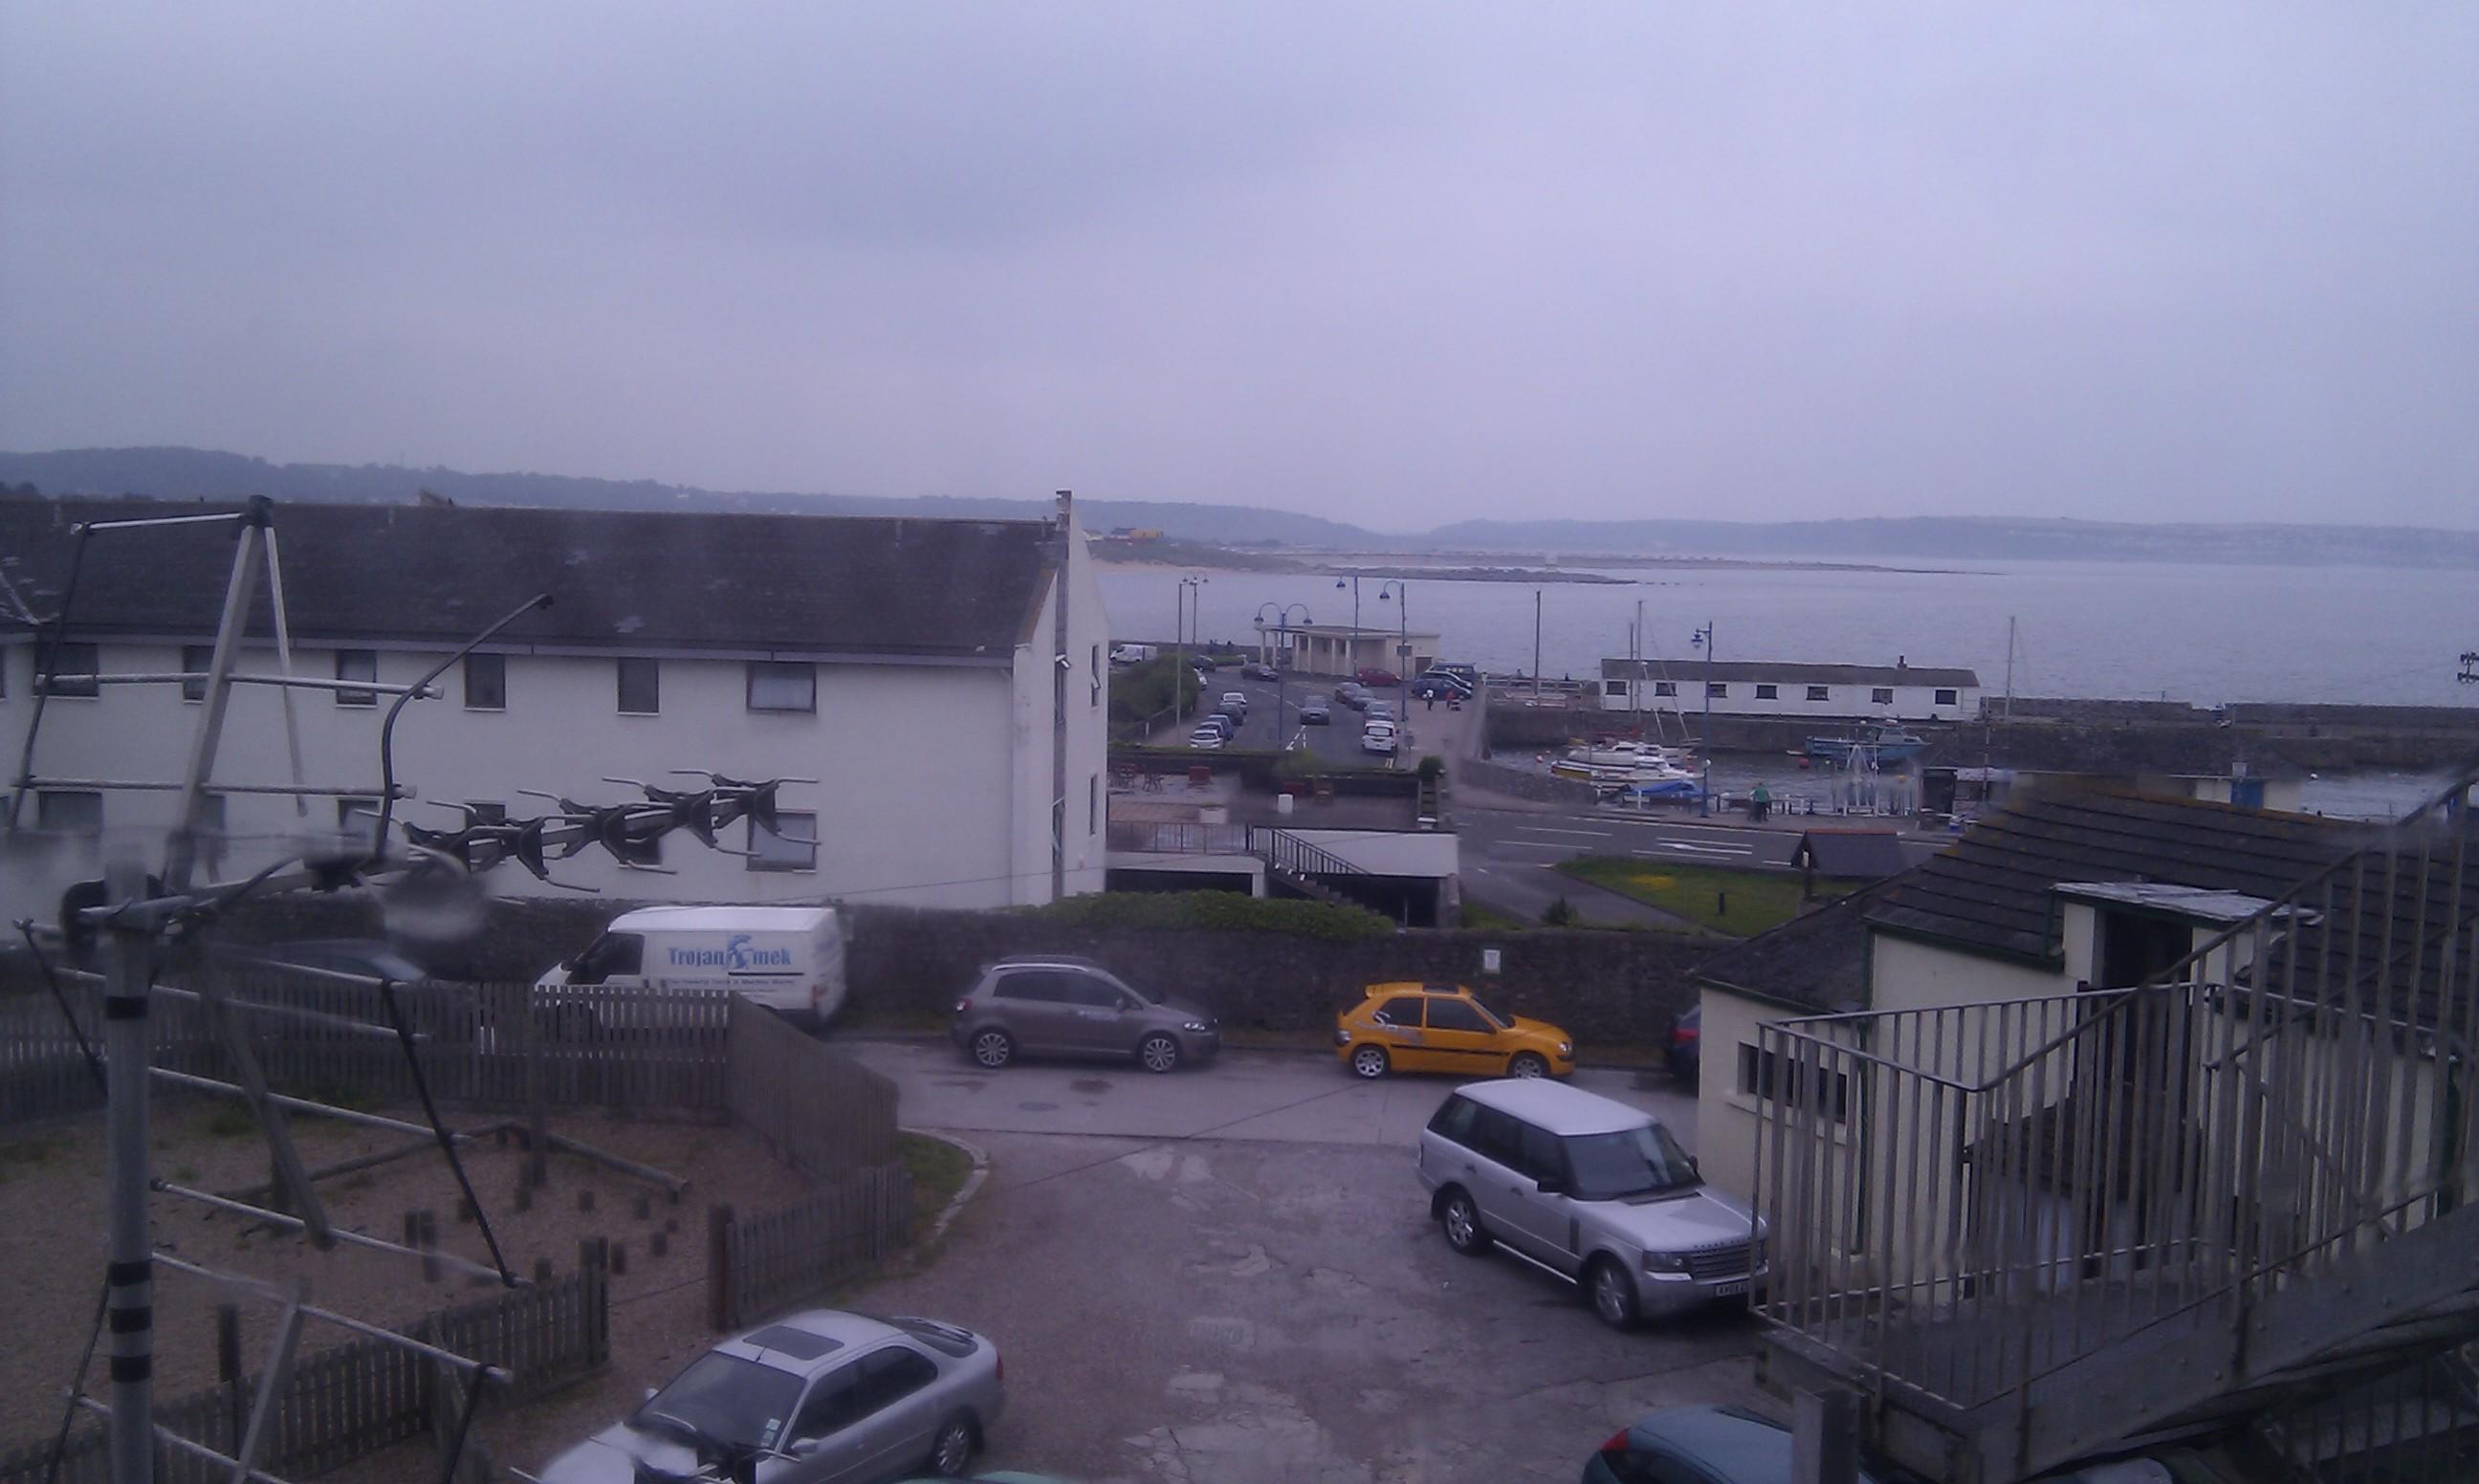 The Pier Hotel, Porthcawl